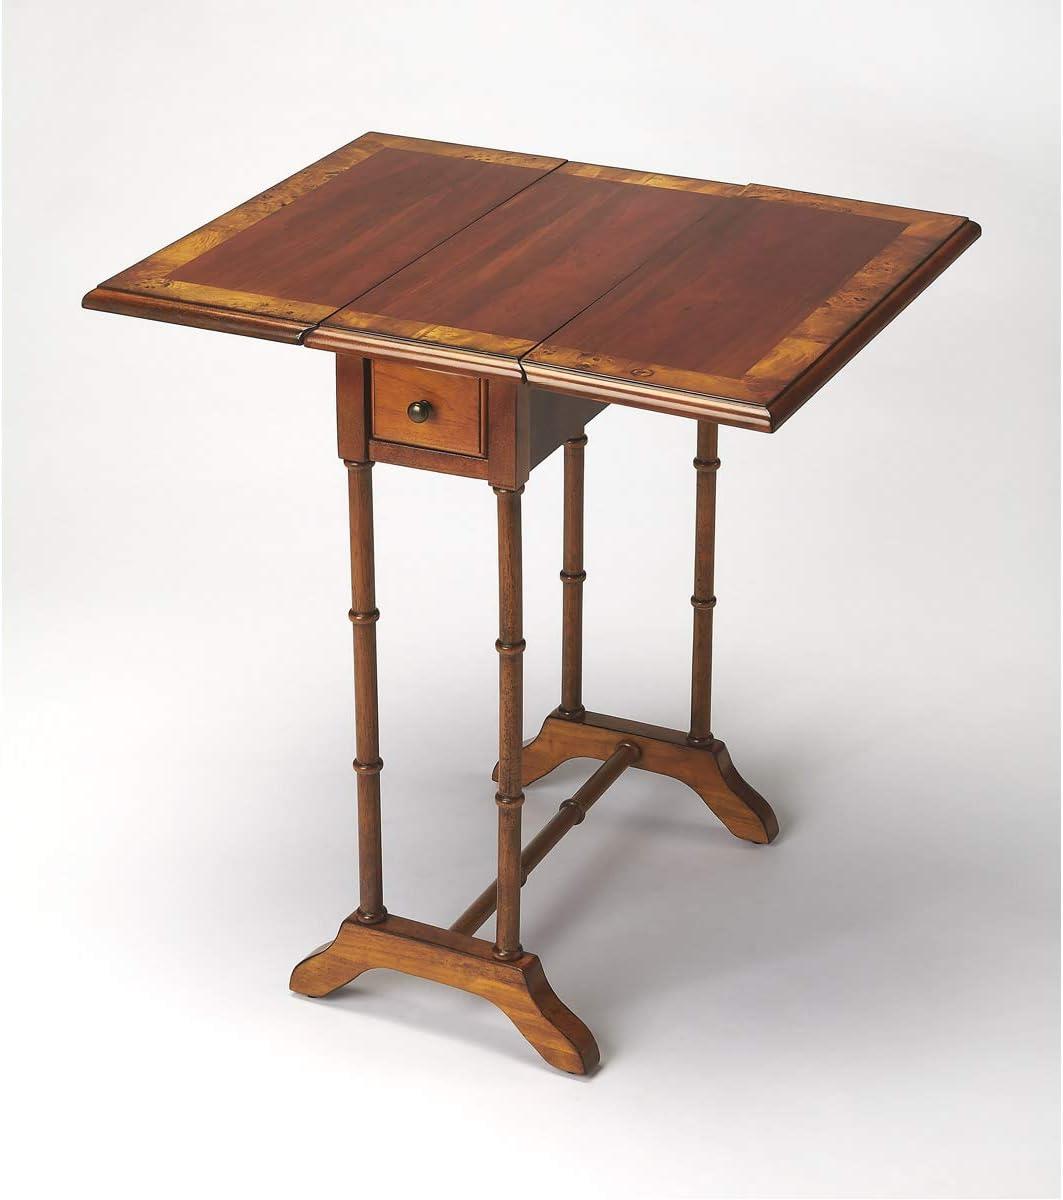 BUTLER 2334101 DARROW OLIVE ASH BURL DROP-LEAF TABLE